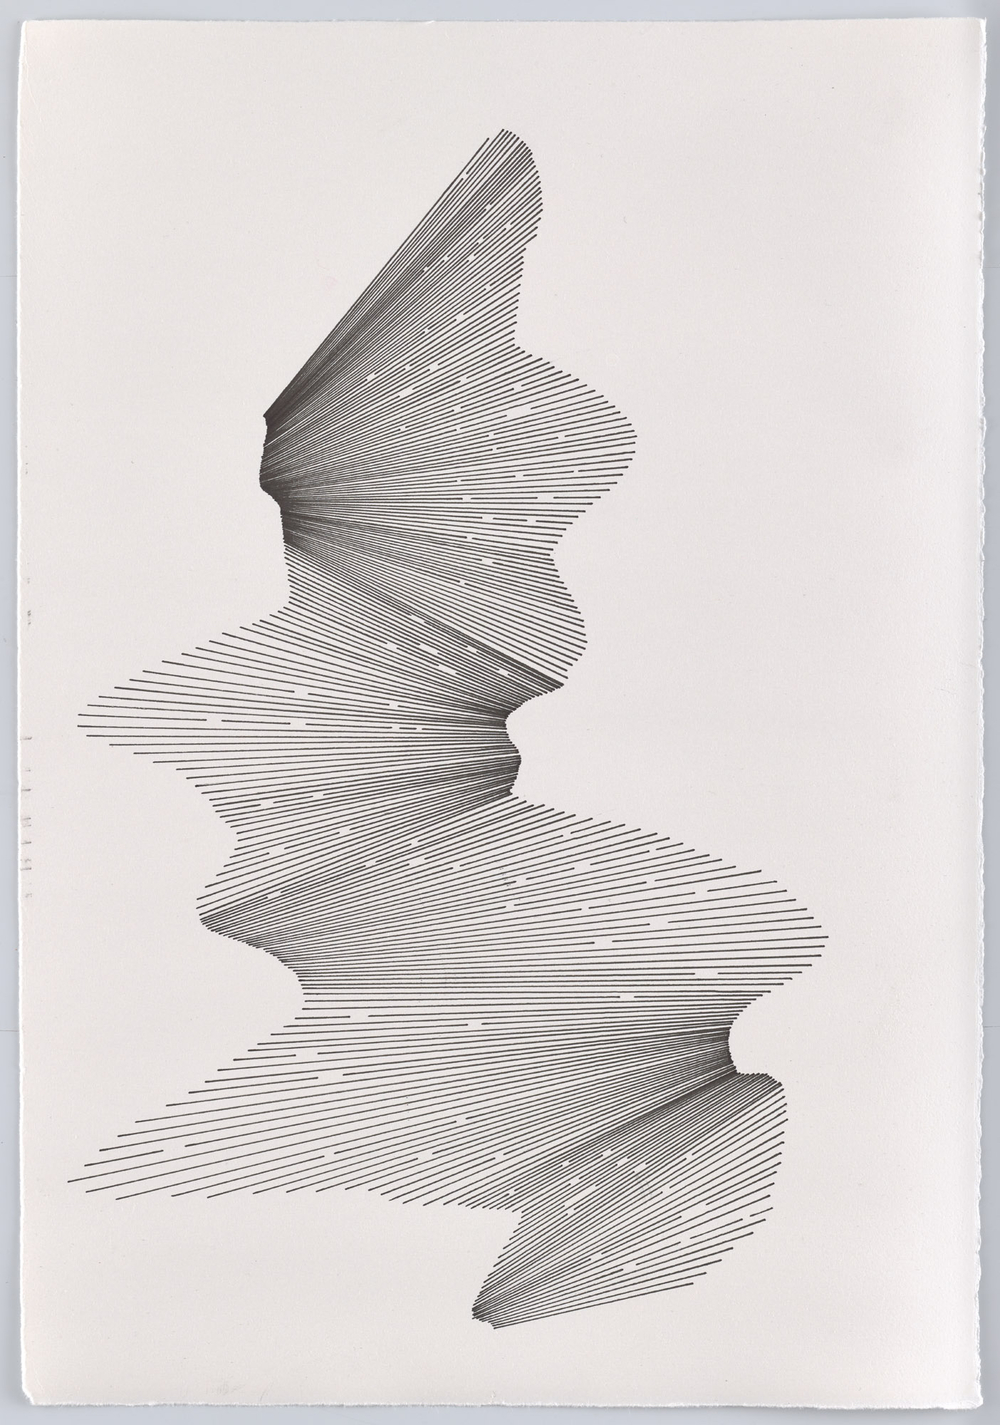 BK P13005 | untitled | pigment liner on paper | 42x29cm | 2016